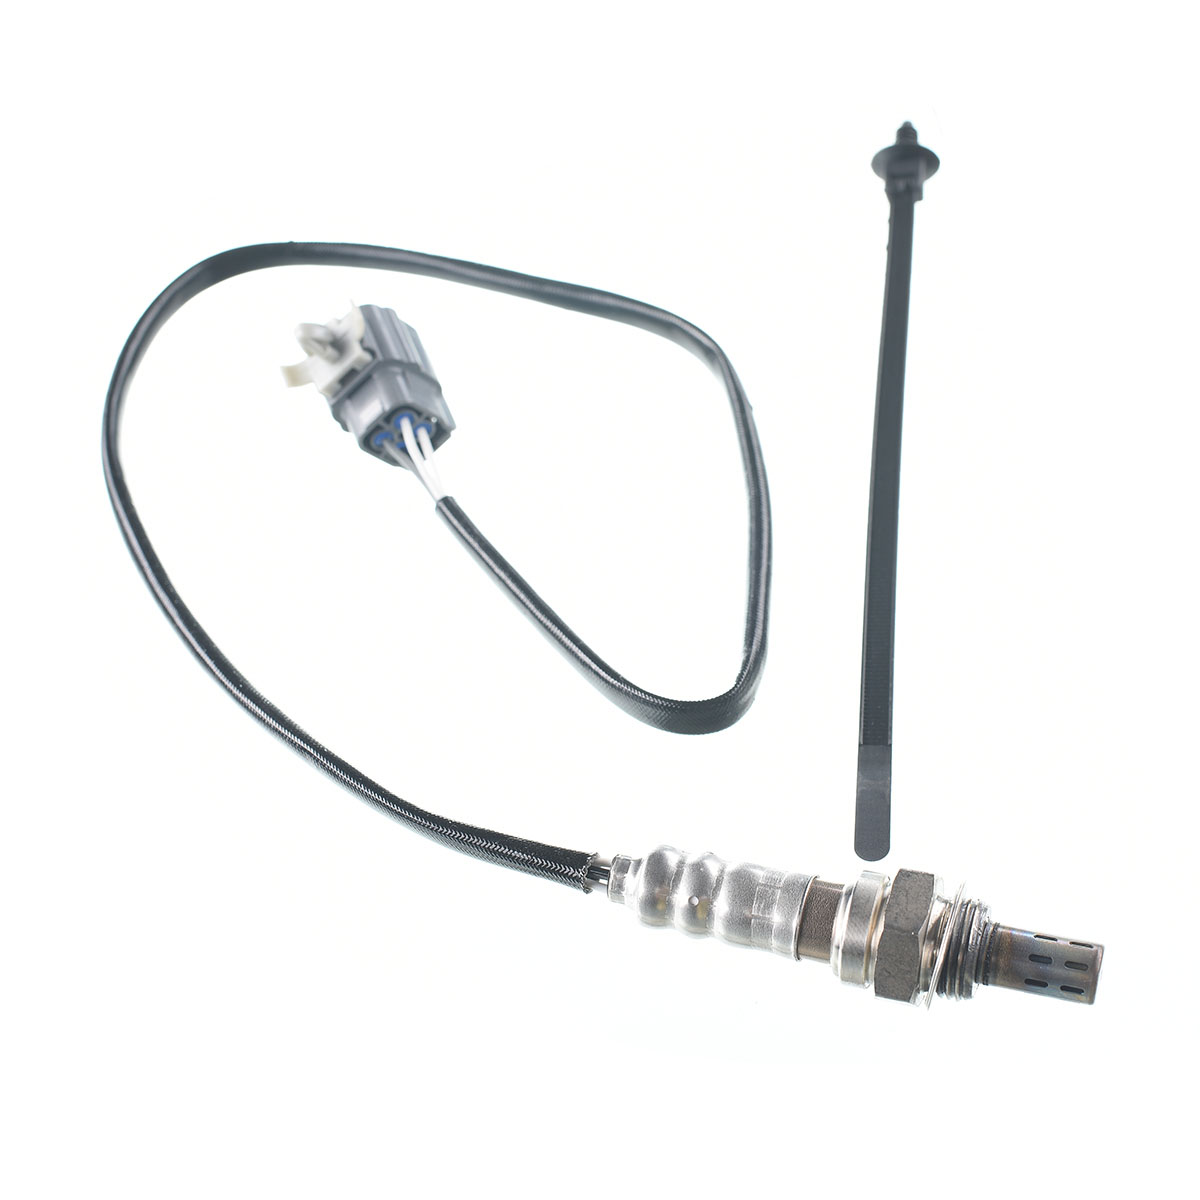 O2 Oxygen Sensor for Mazda 626 2000 2001 2002 2.0L 2.5L